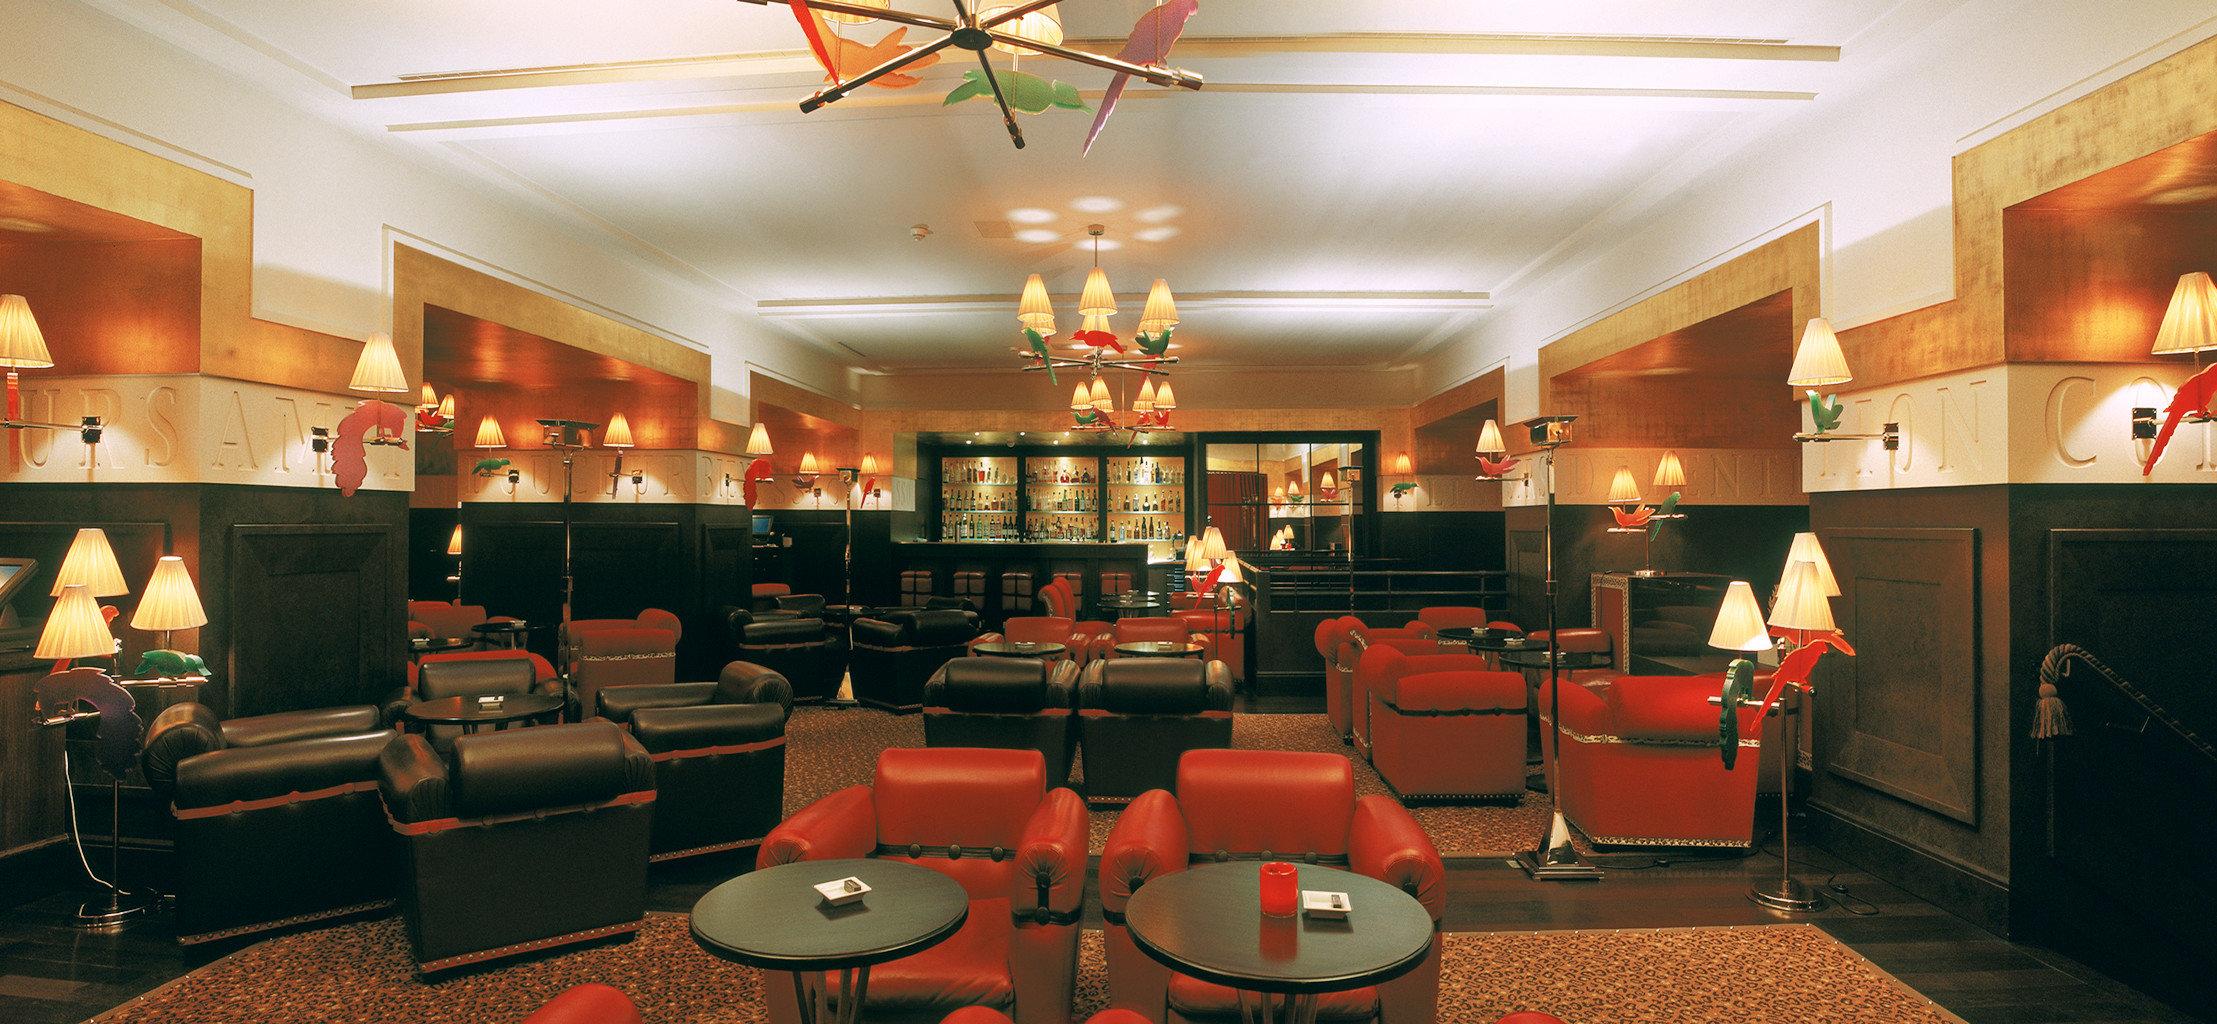 Bar Dining Drink Eat restaurant Lobby function hall café recreation room